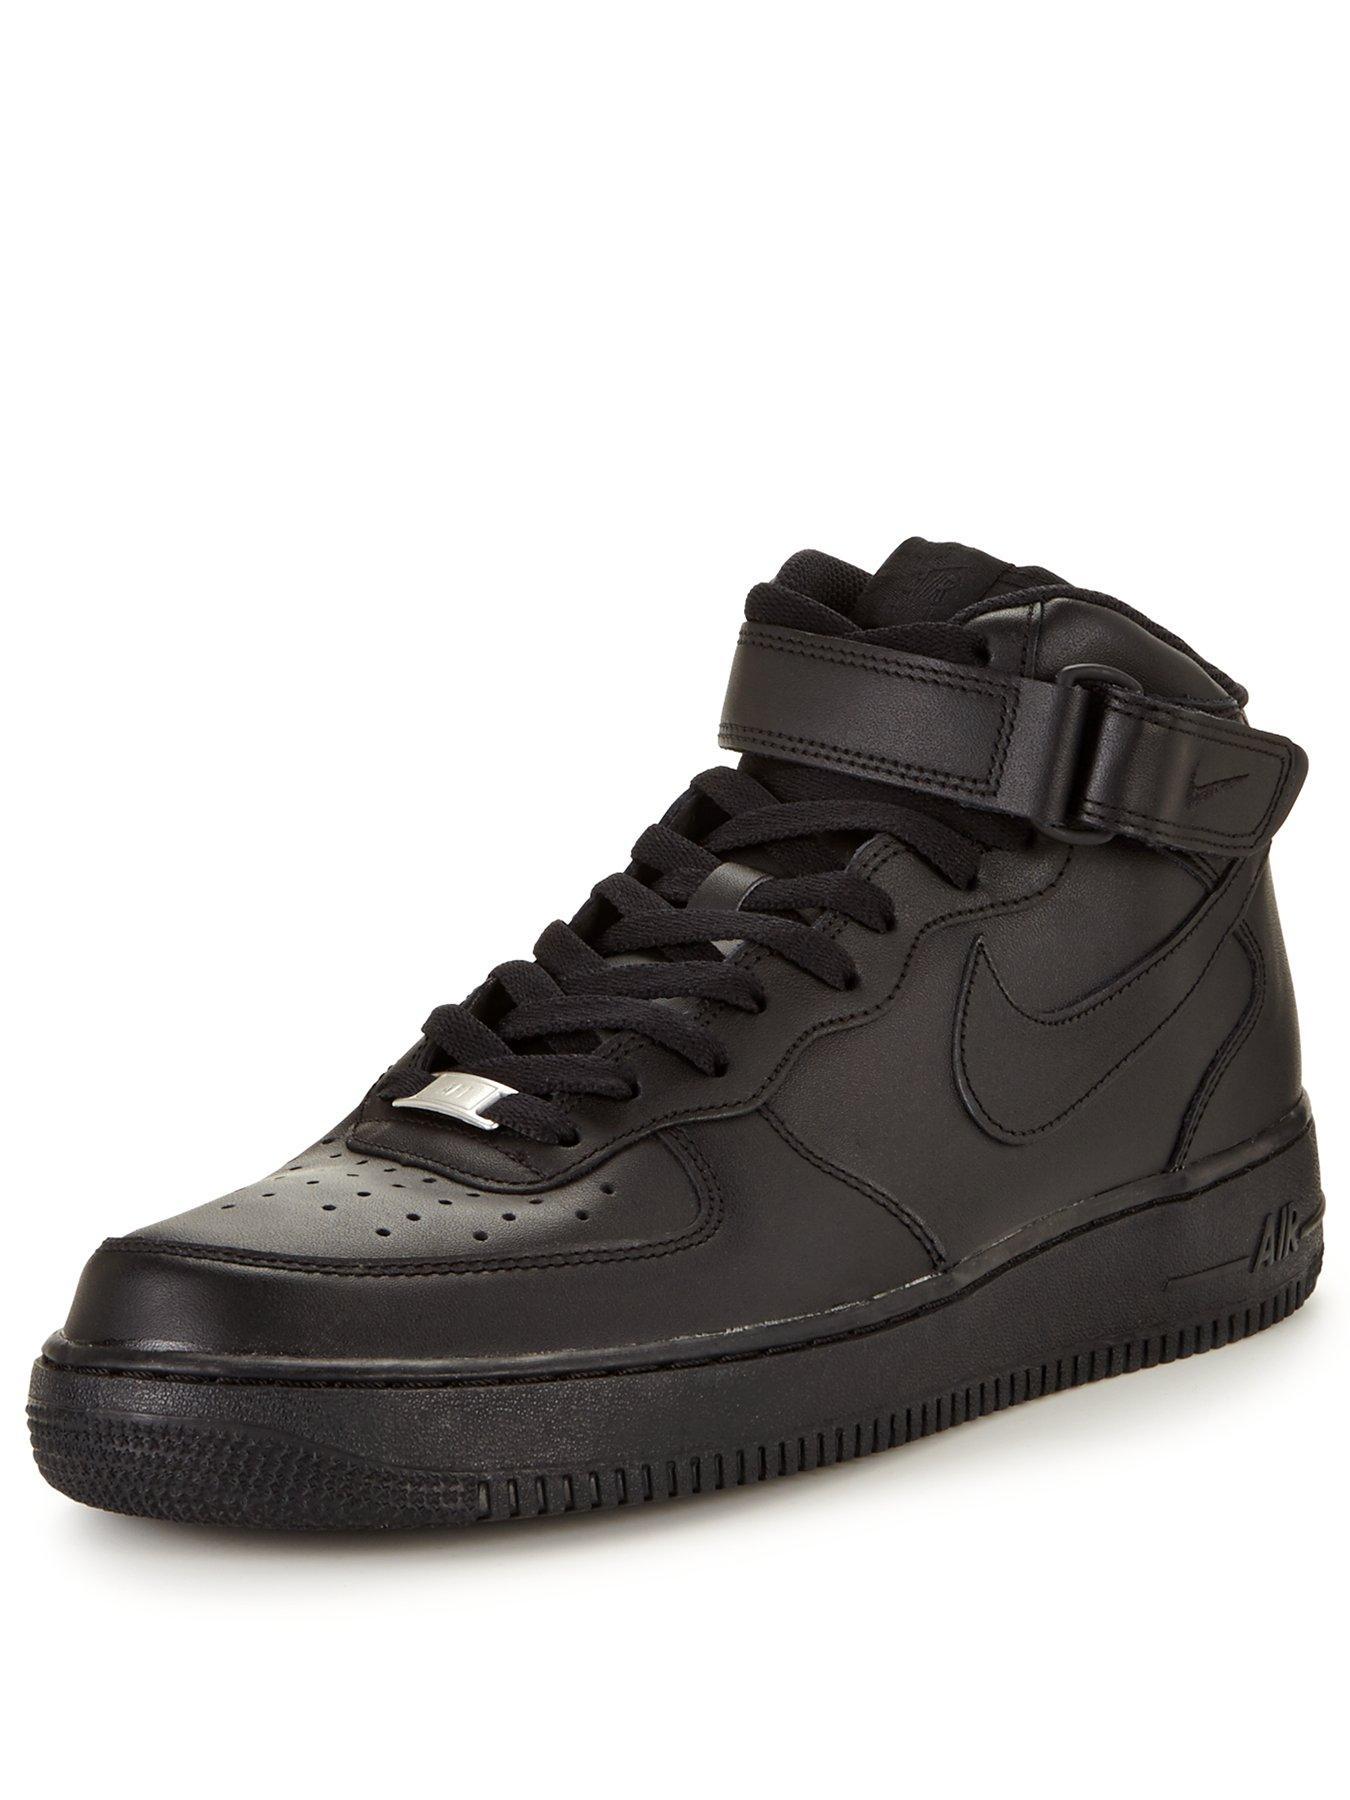 uk Force co Trainers Very Nike Air 1Mens qUMjVpSLGz